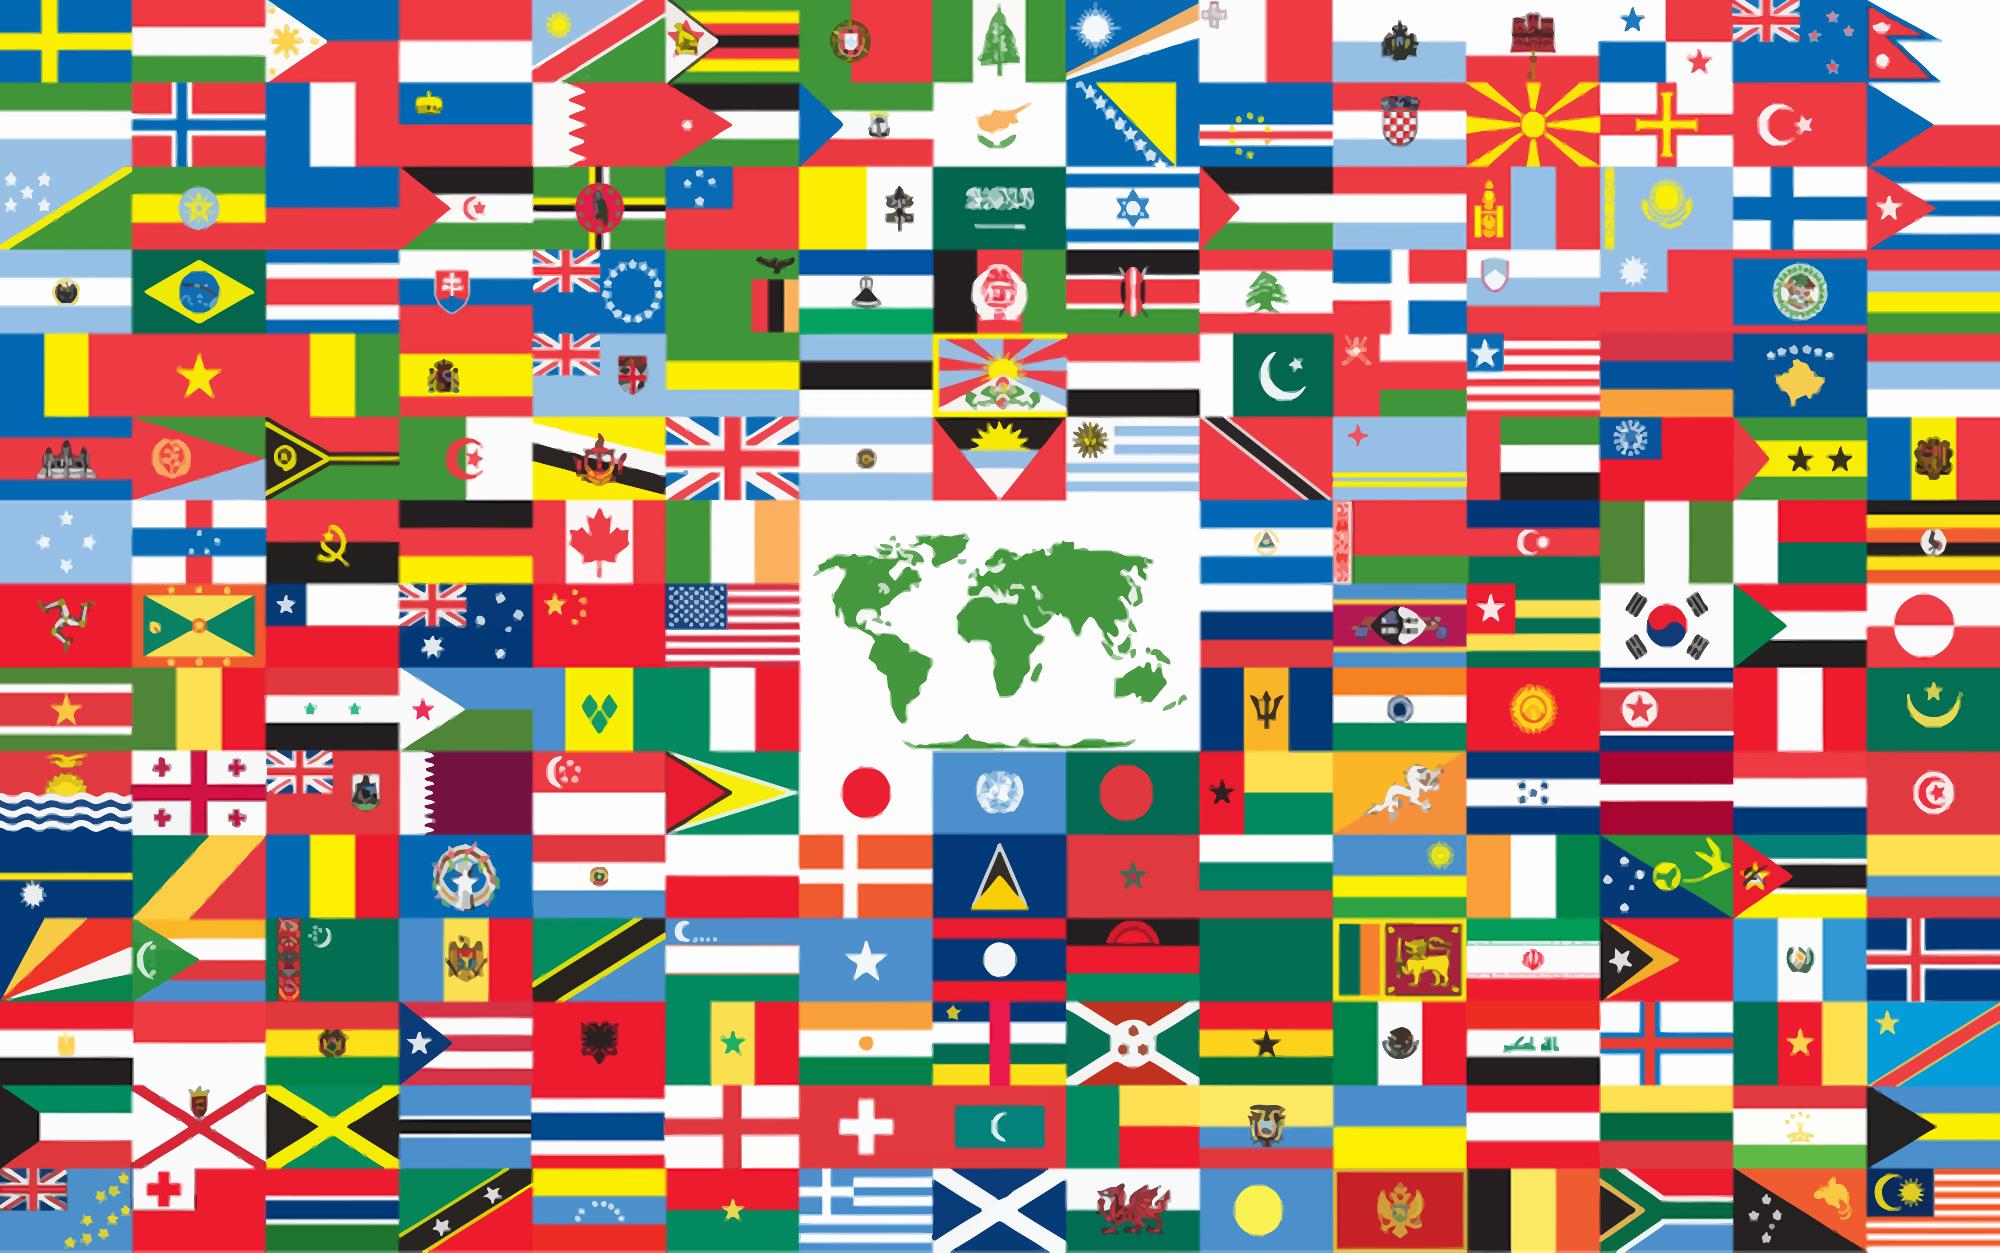 The world flag, 2006